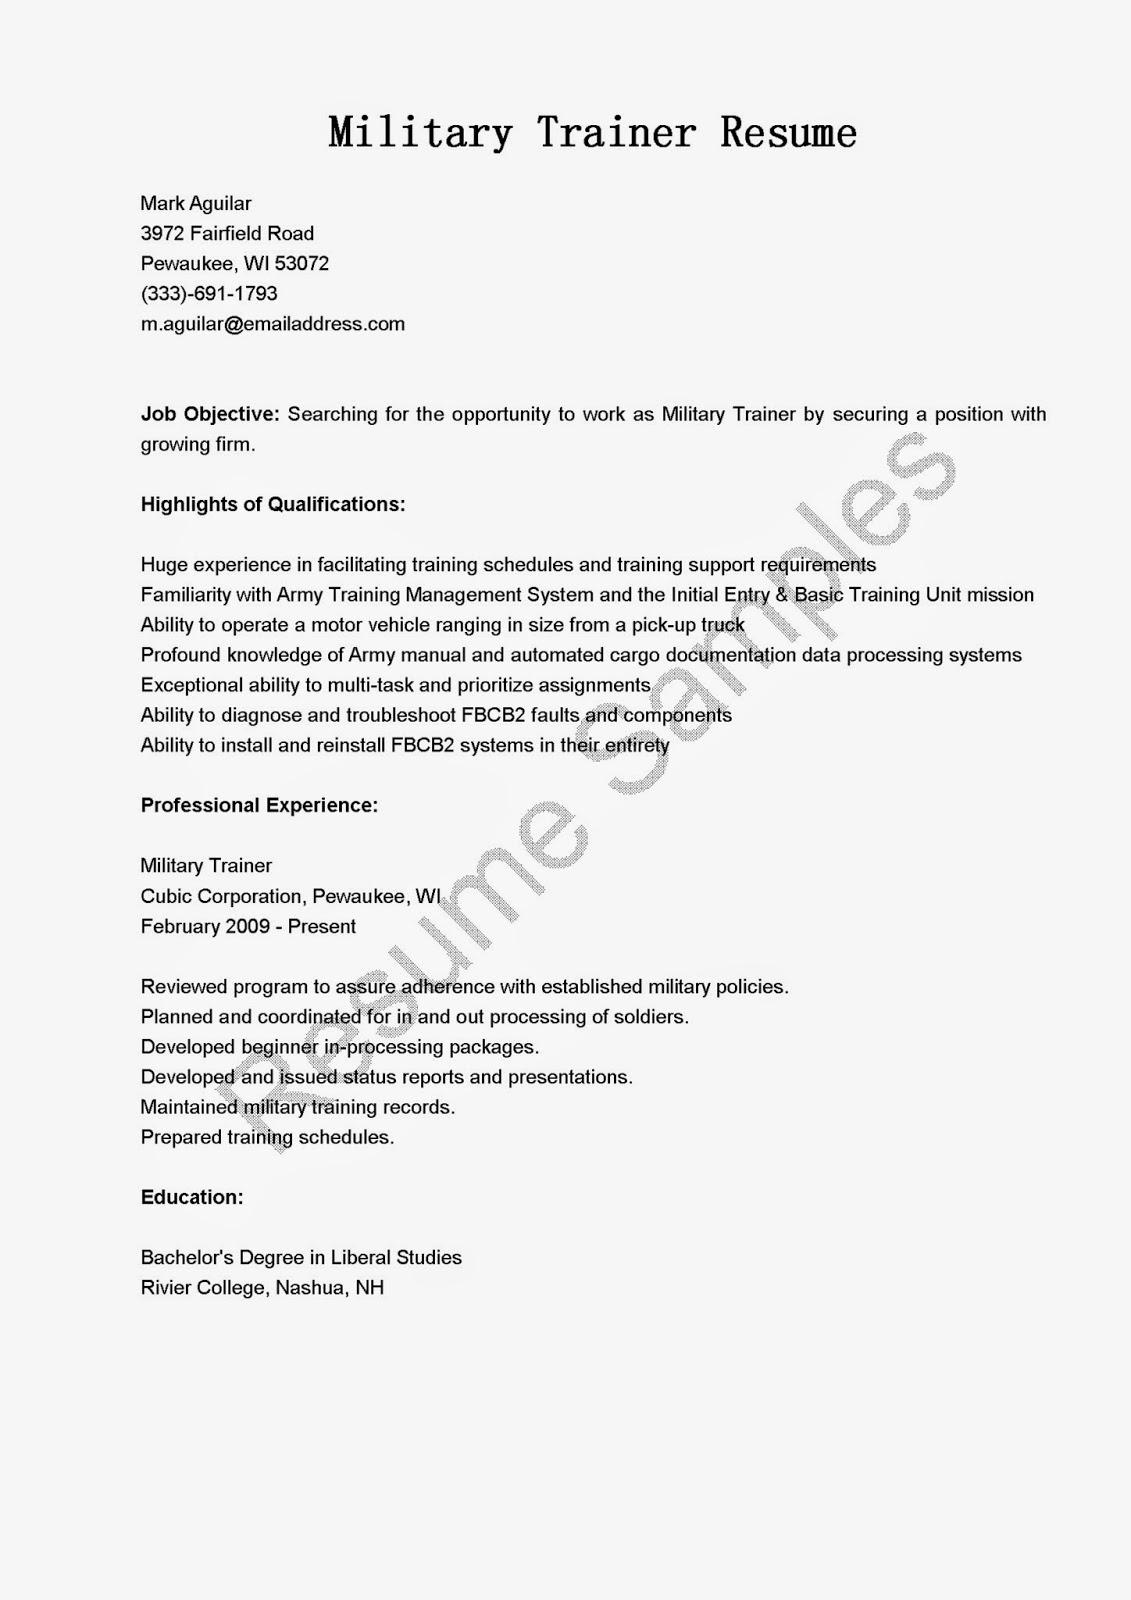 resume samples  military trainer resume sample